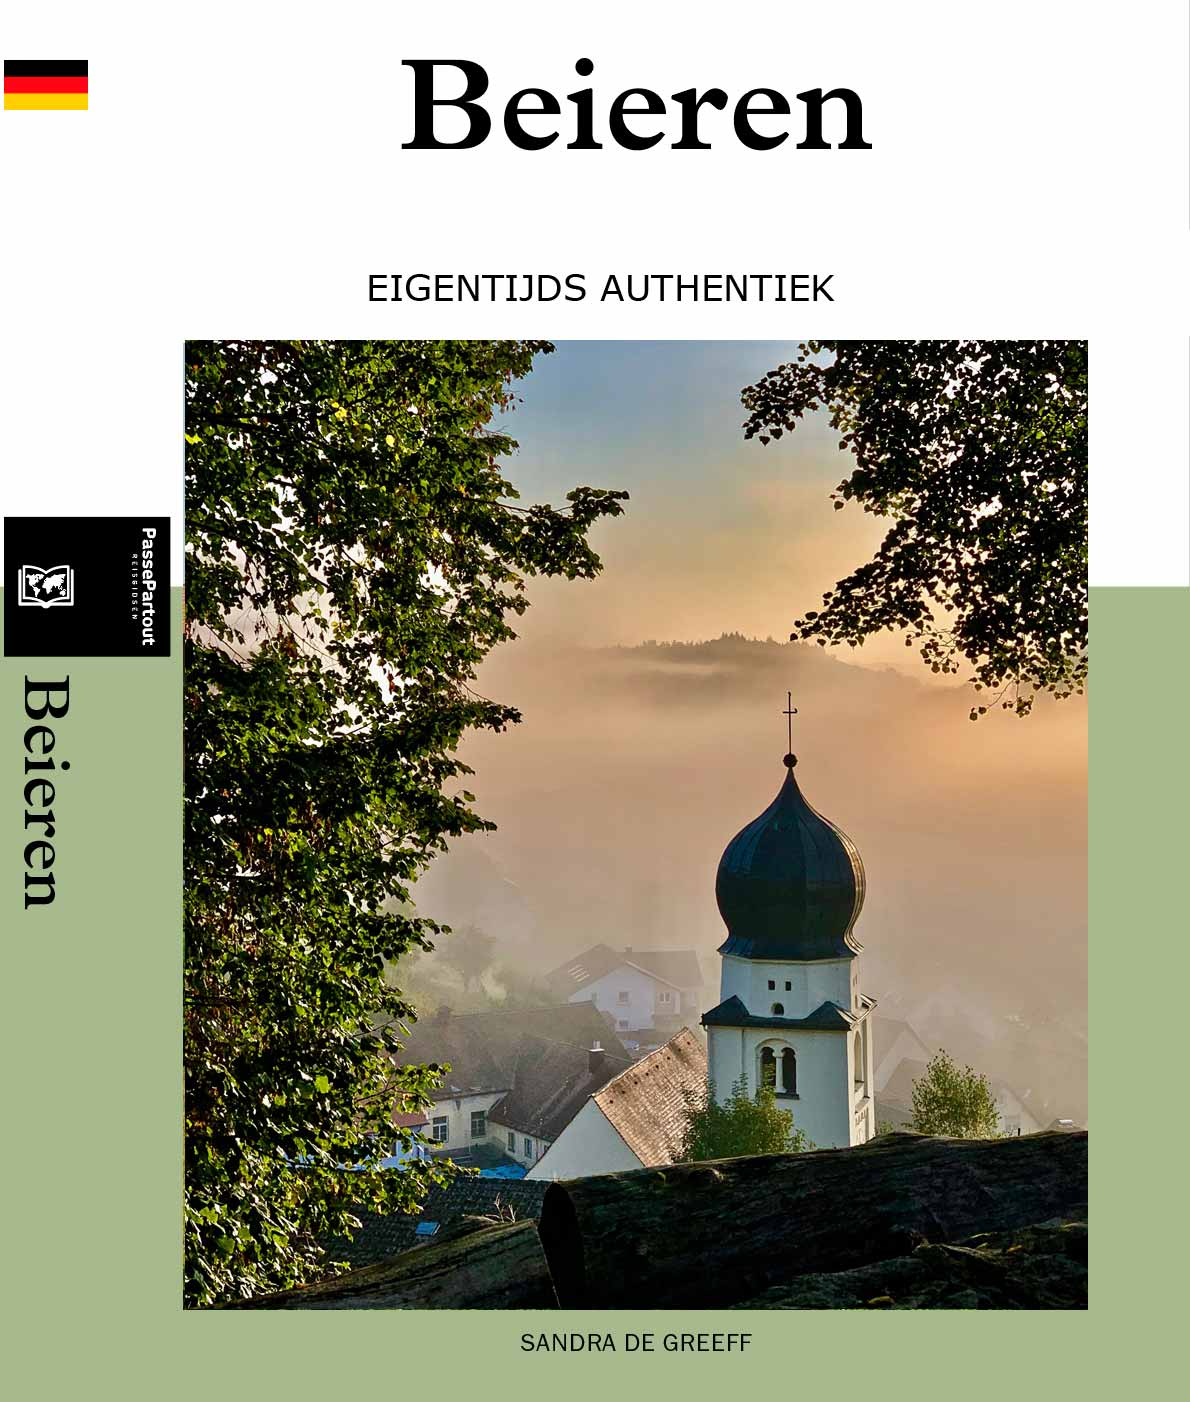 Reisgids Beieren eigentijds authentiek